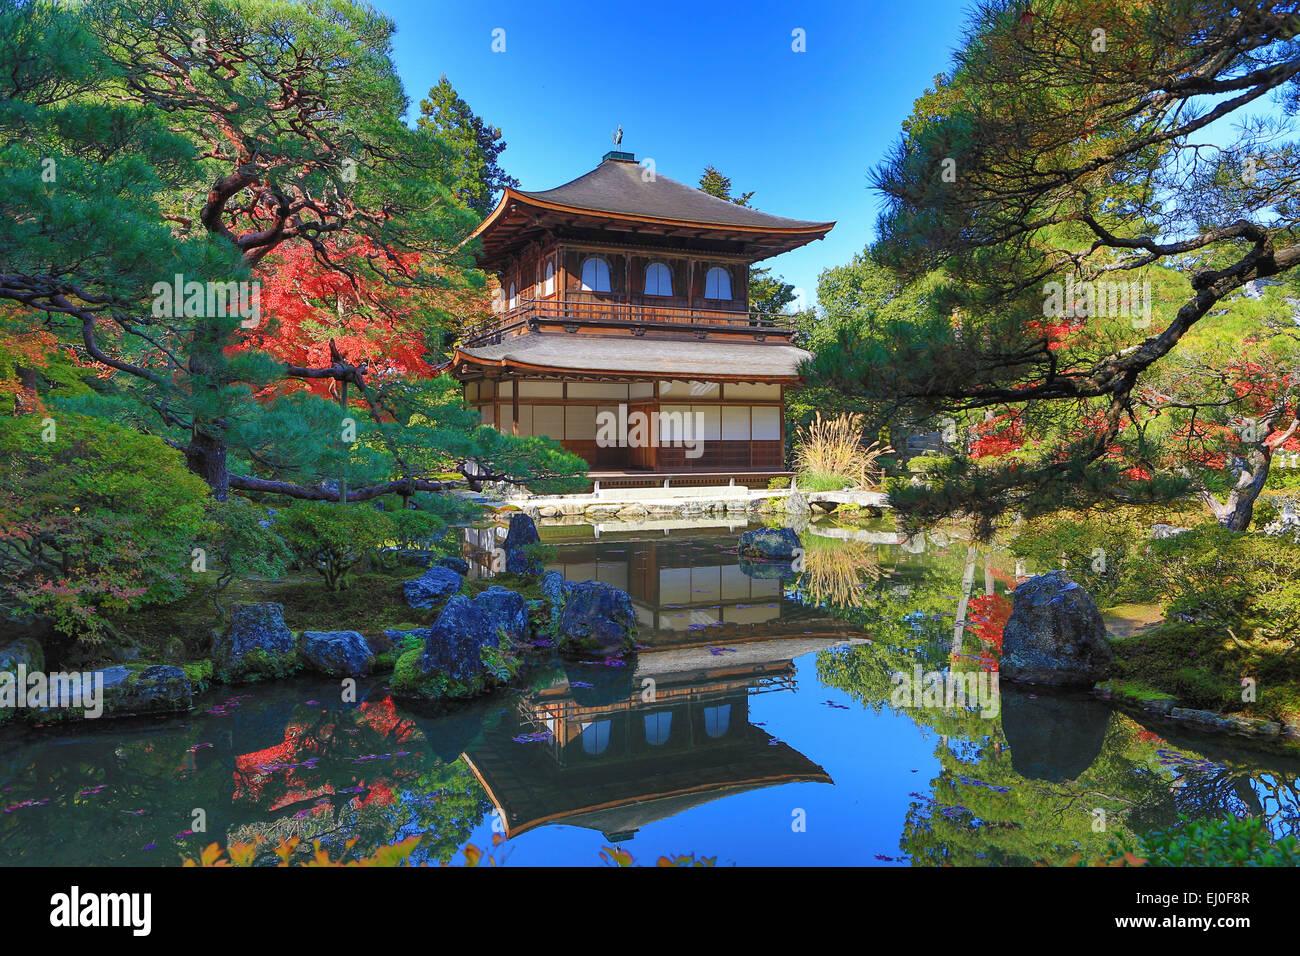 Patrimoine mondial, Ginkaku-ji, Japon, Asie, Kansai, Kyoto, Japon, paysage, architecture, Automne, couleurs, jardin, Photo Stock